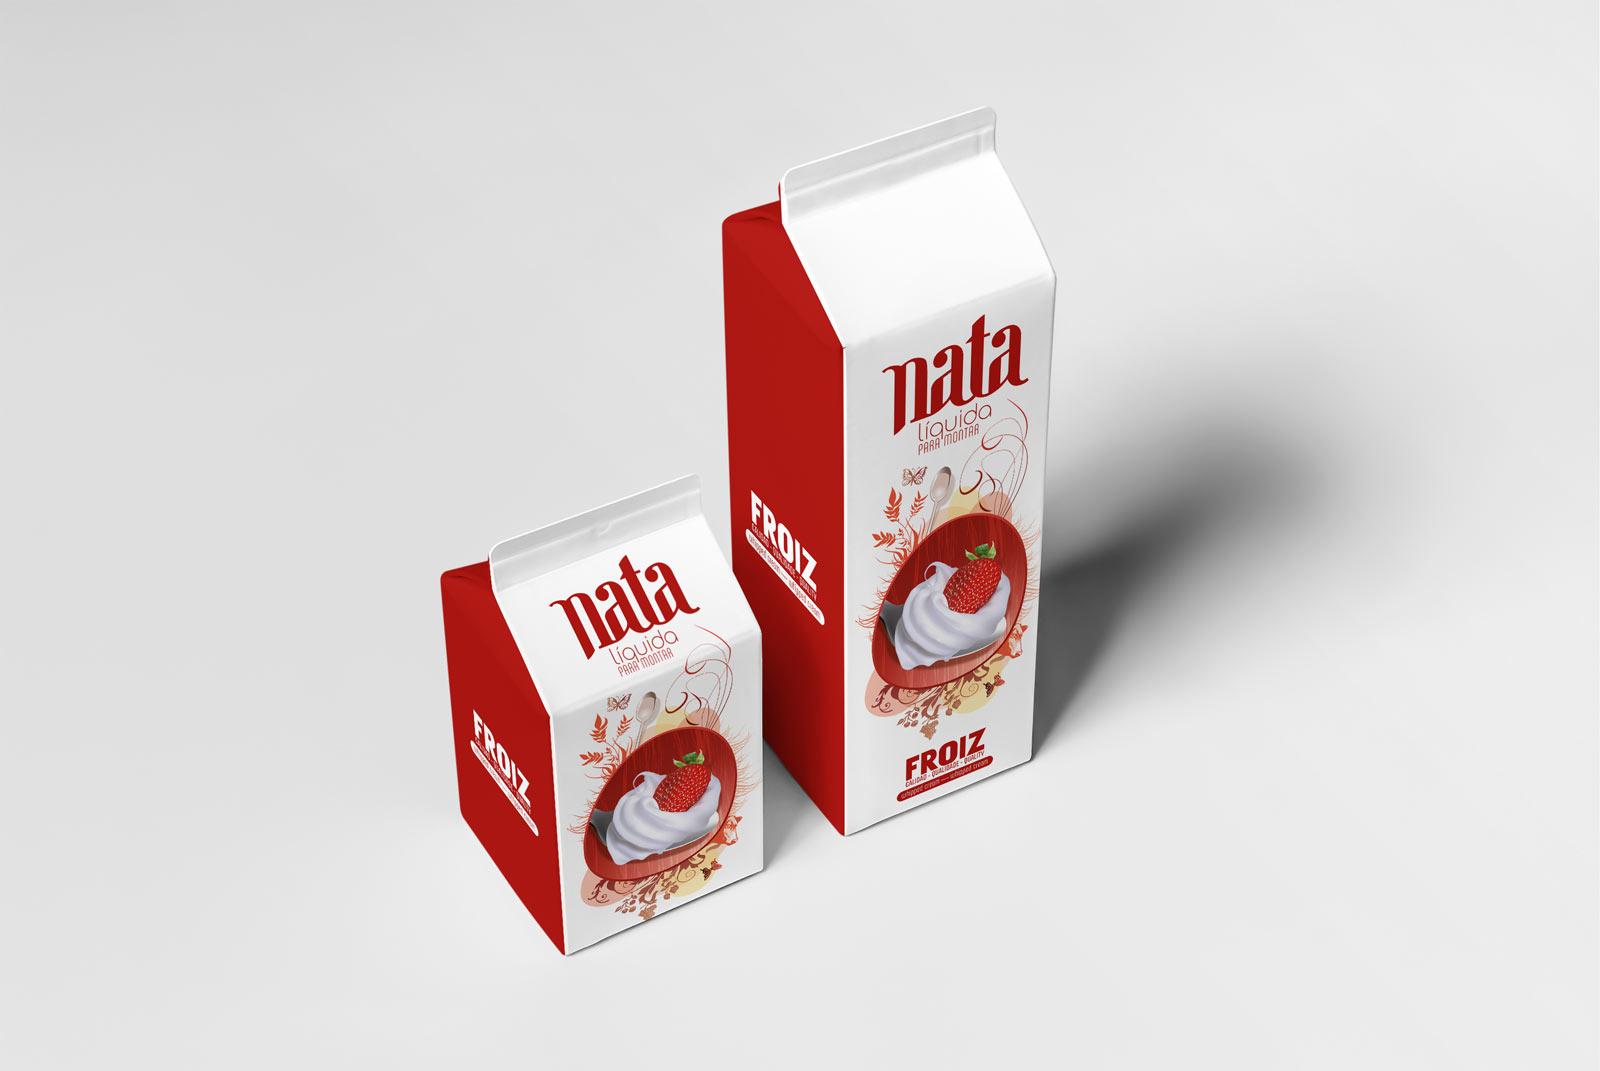 Froiz-nata-packaging-03